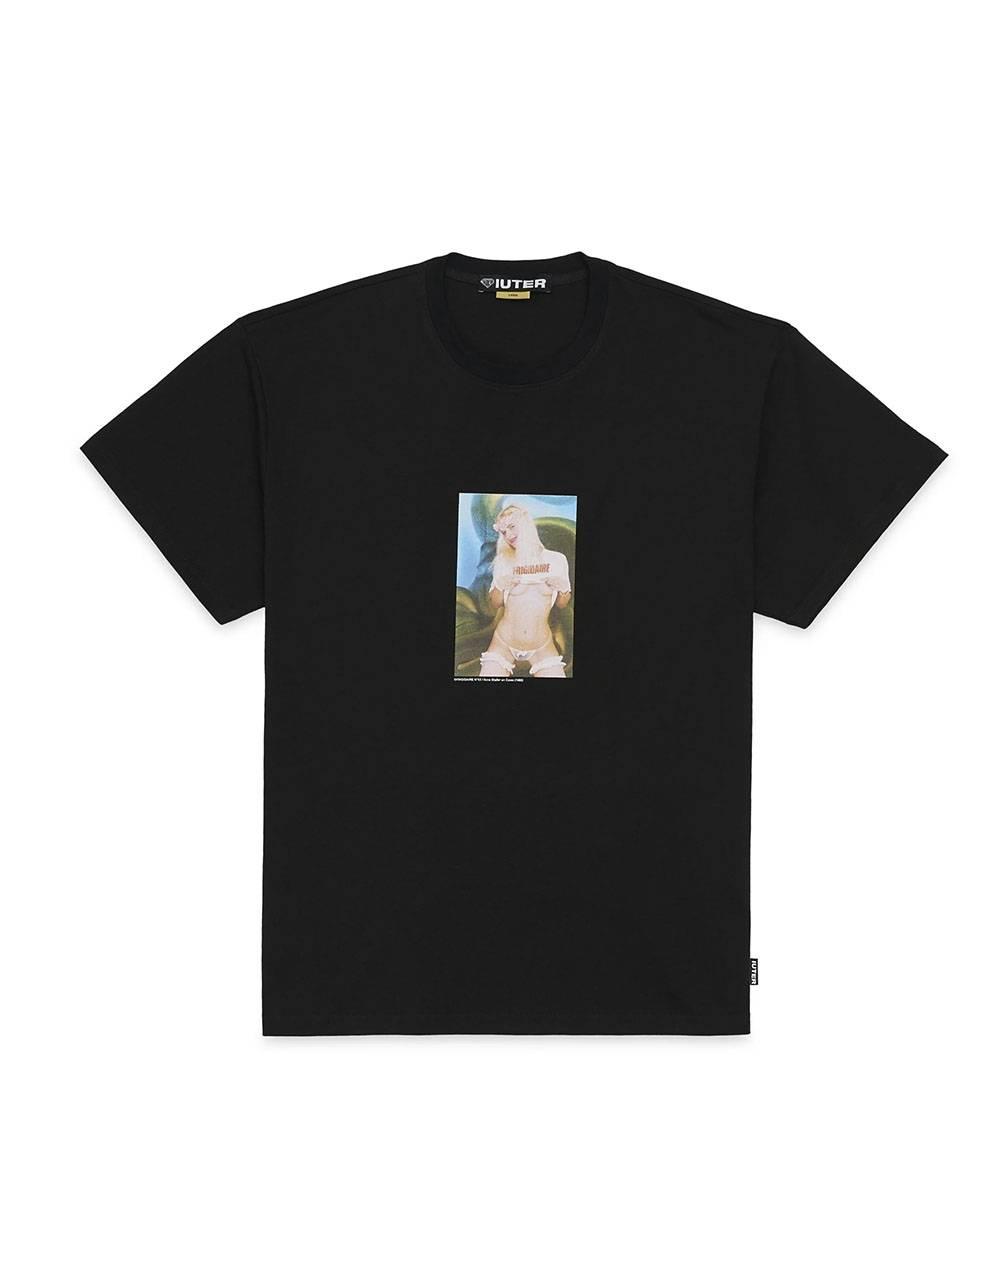 Iuter Frigidaire Ilona tee - Black IUTER T-shirt 45,08€